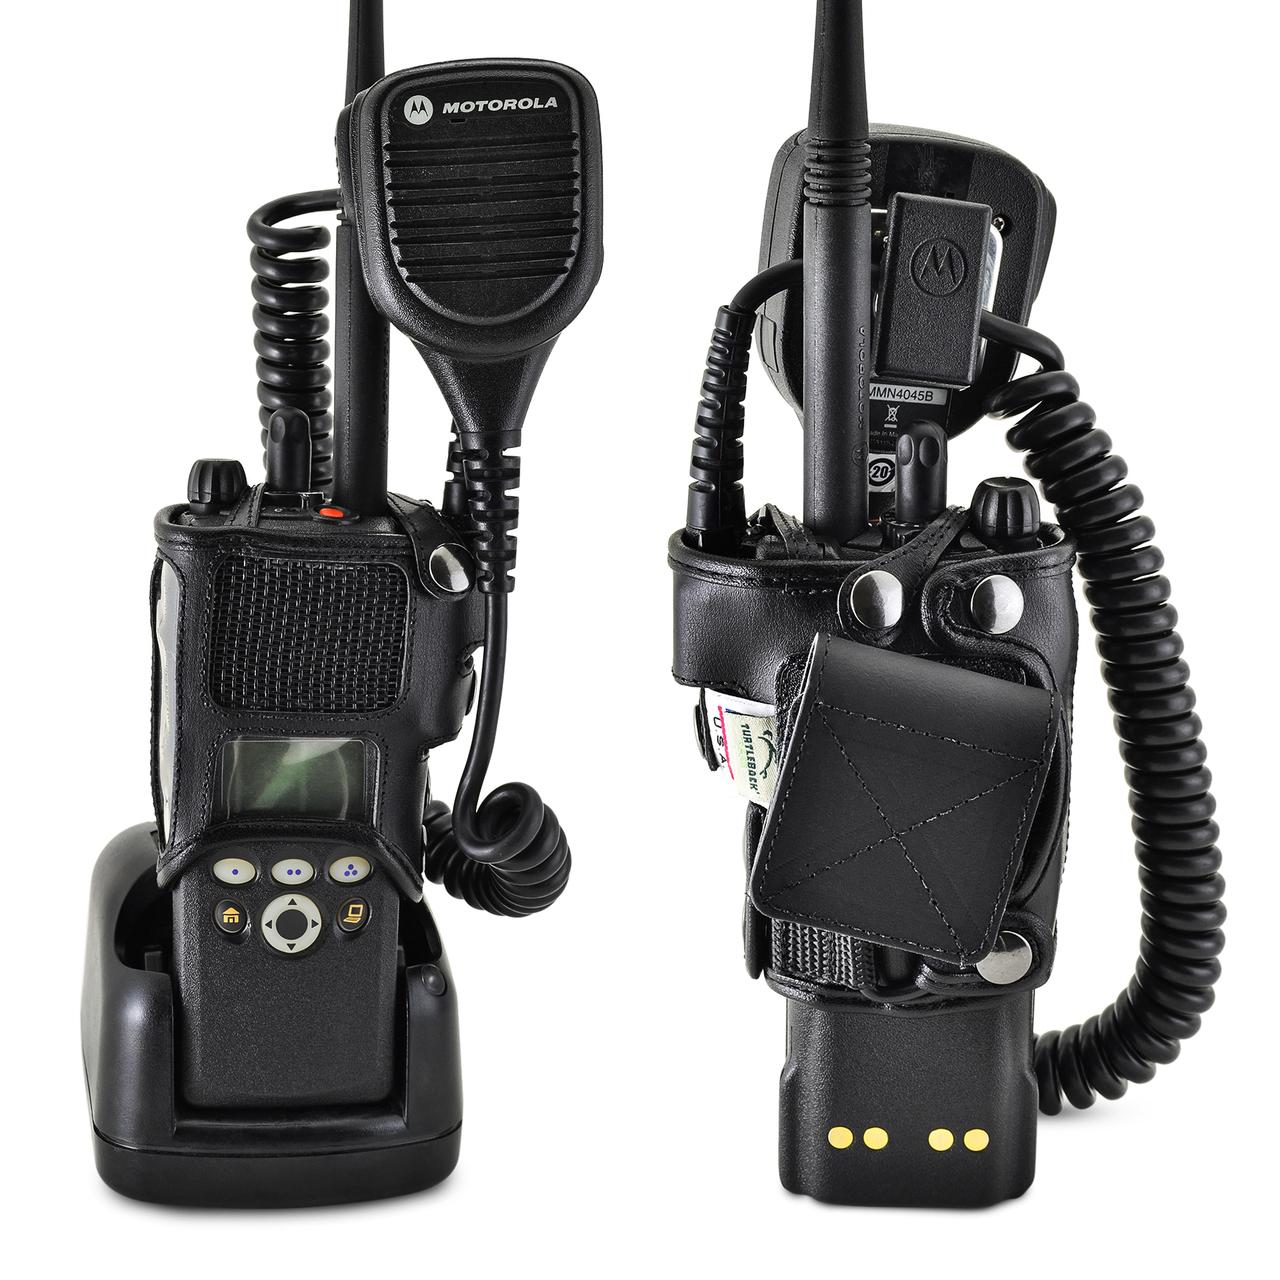 image free download Motorola xts models i. Radio clip.